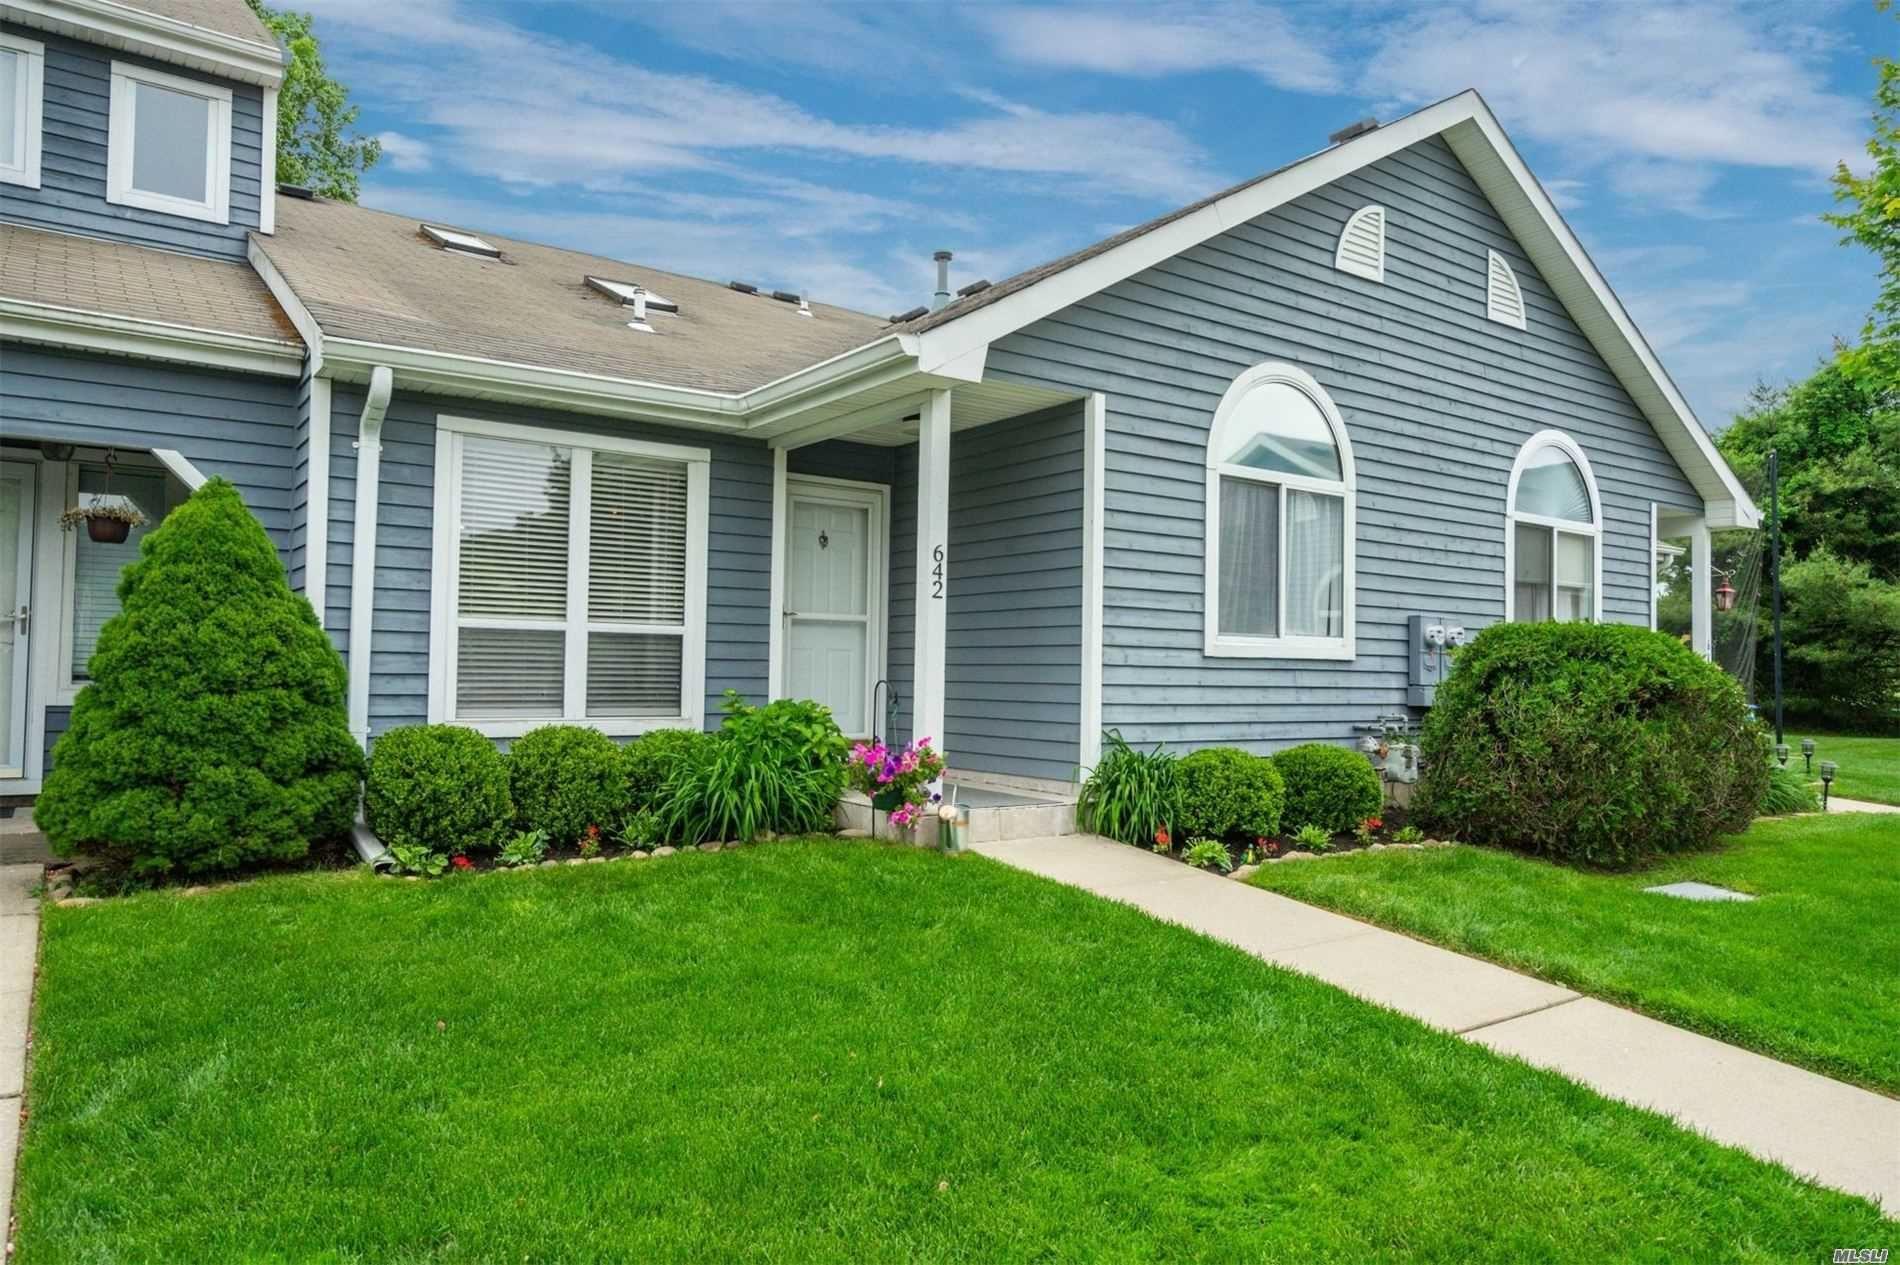 642 Birchwood Park Drive, Middle Island, NY 11953 - MLS#: 3222509